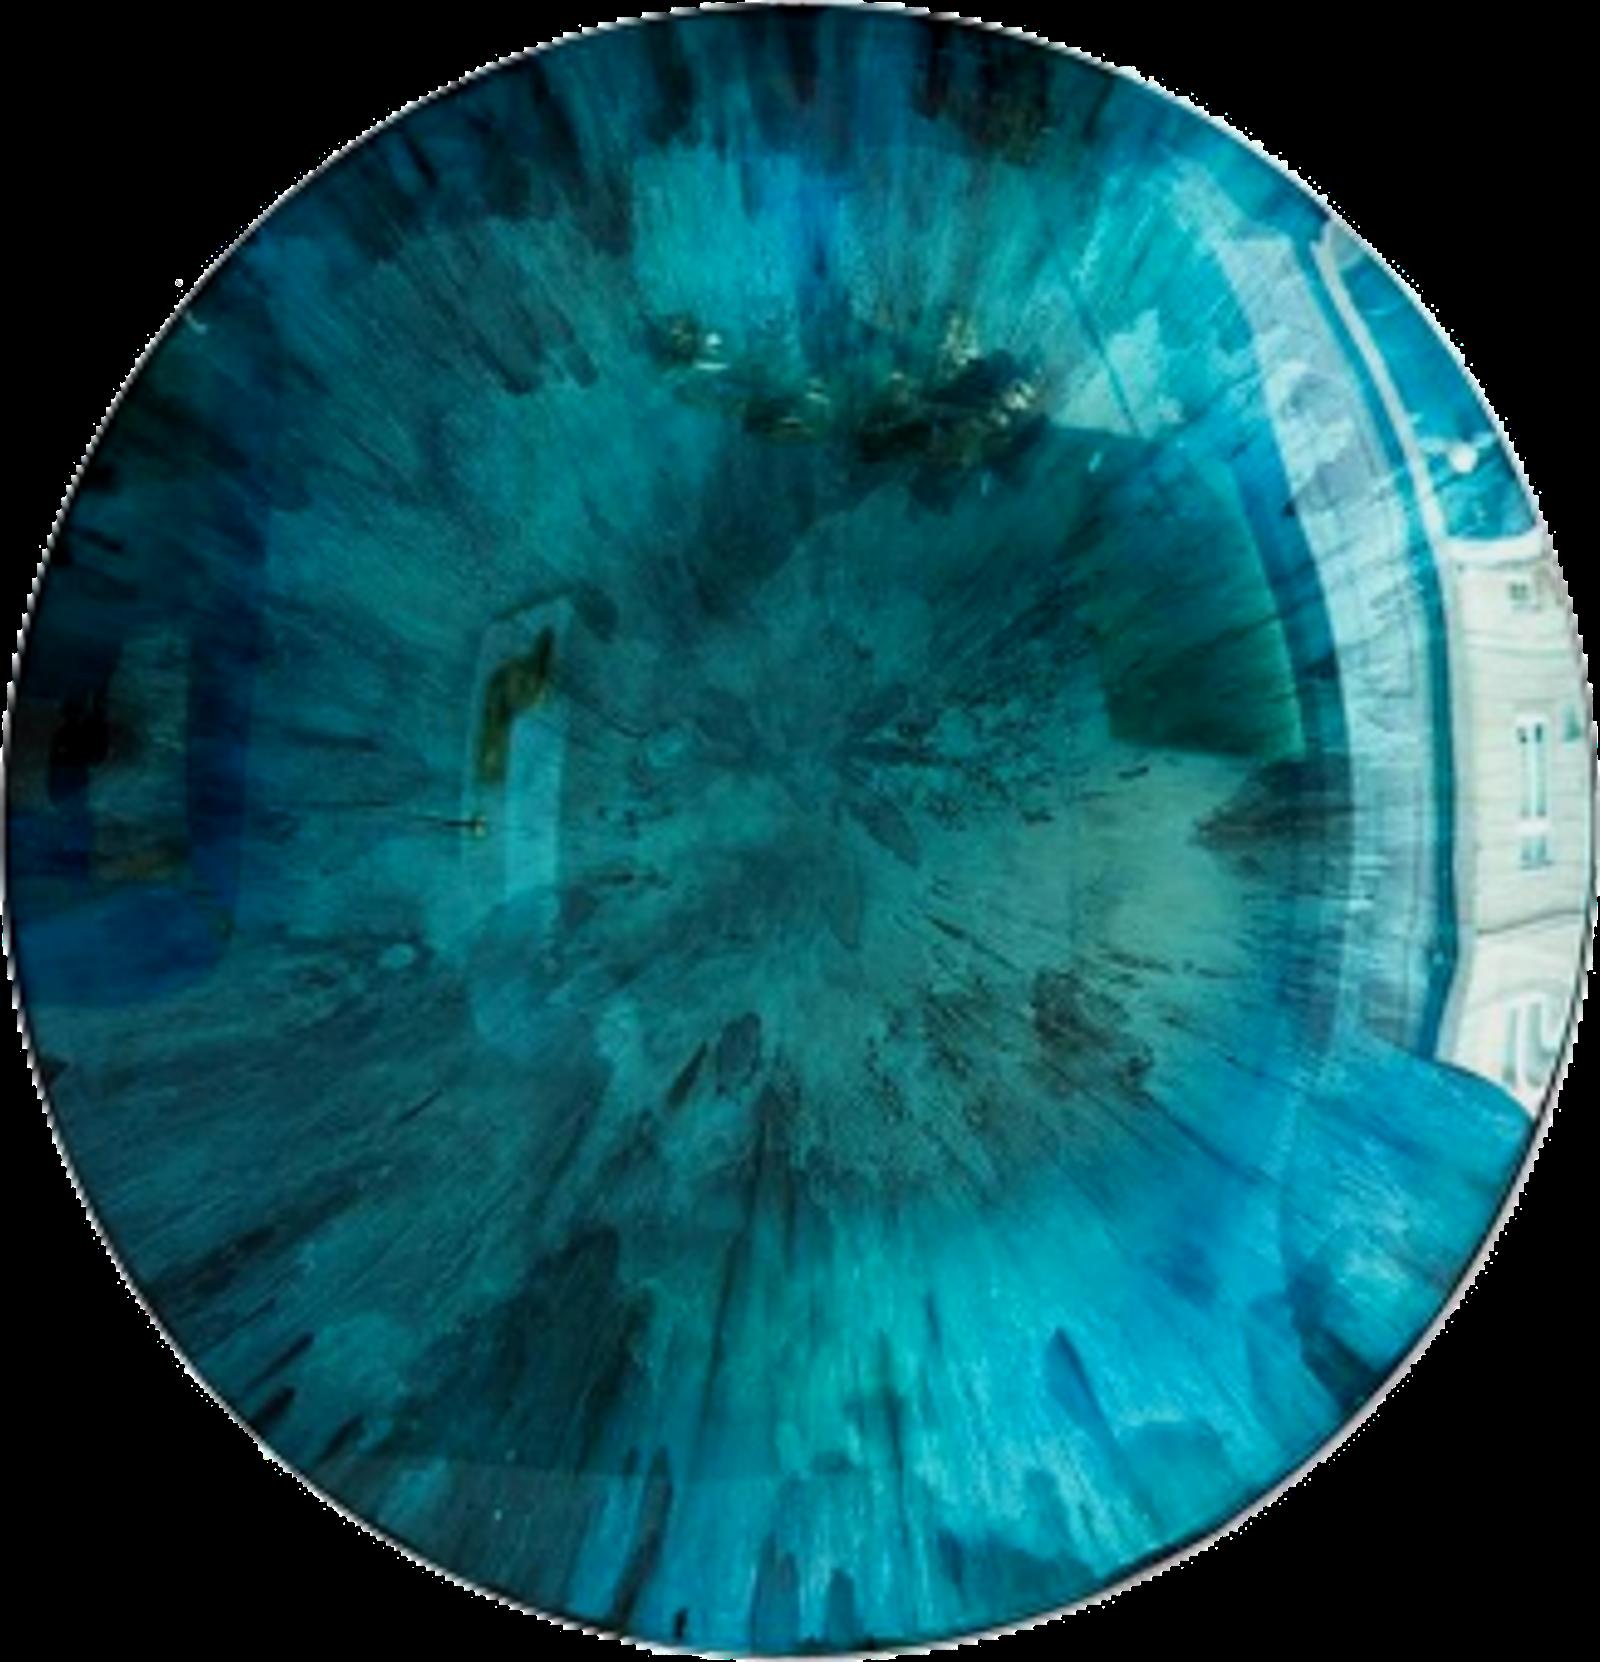 Pin By La Mirada En Color On 画 壁挂 Vintage Mirror Wall Sculpture Art Art